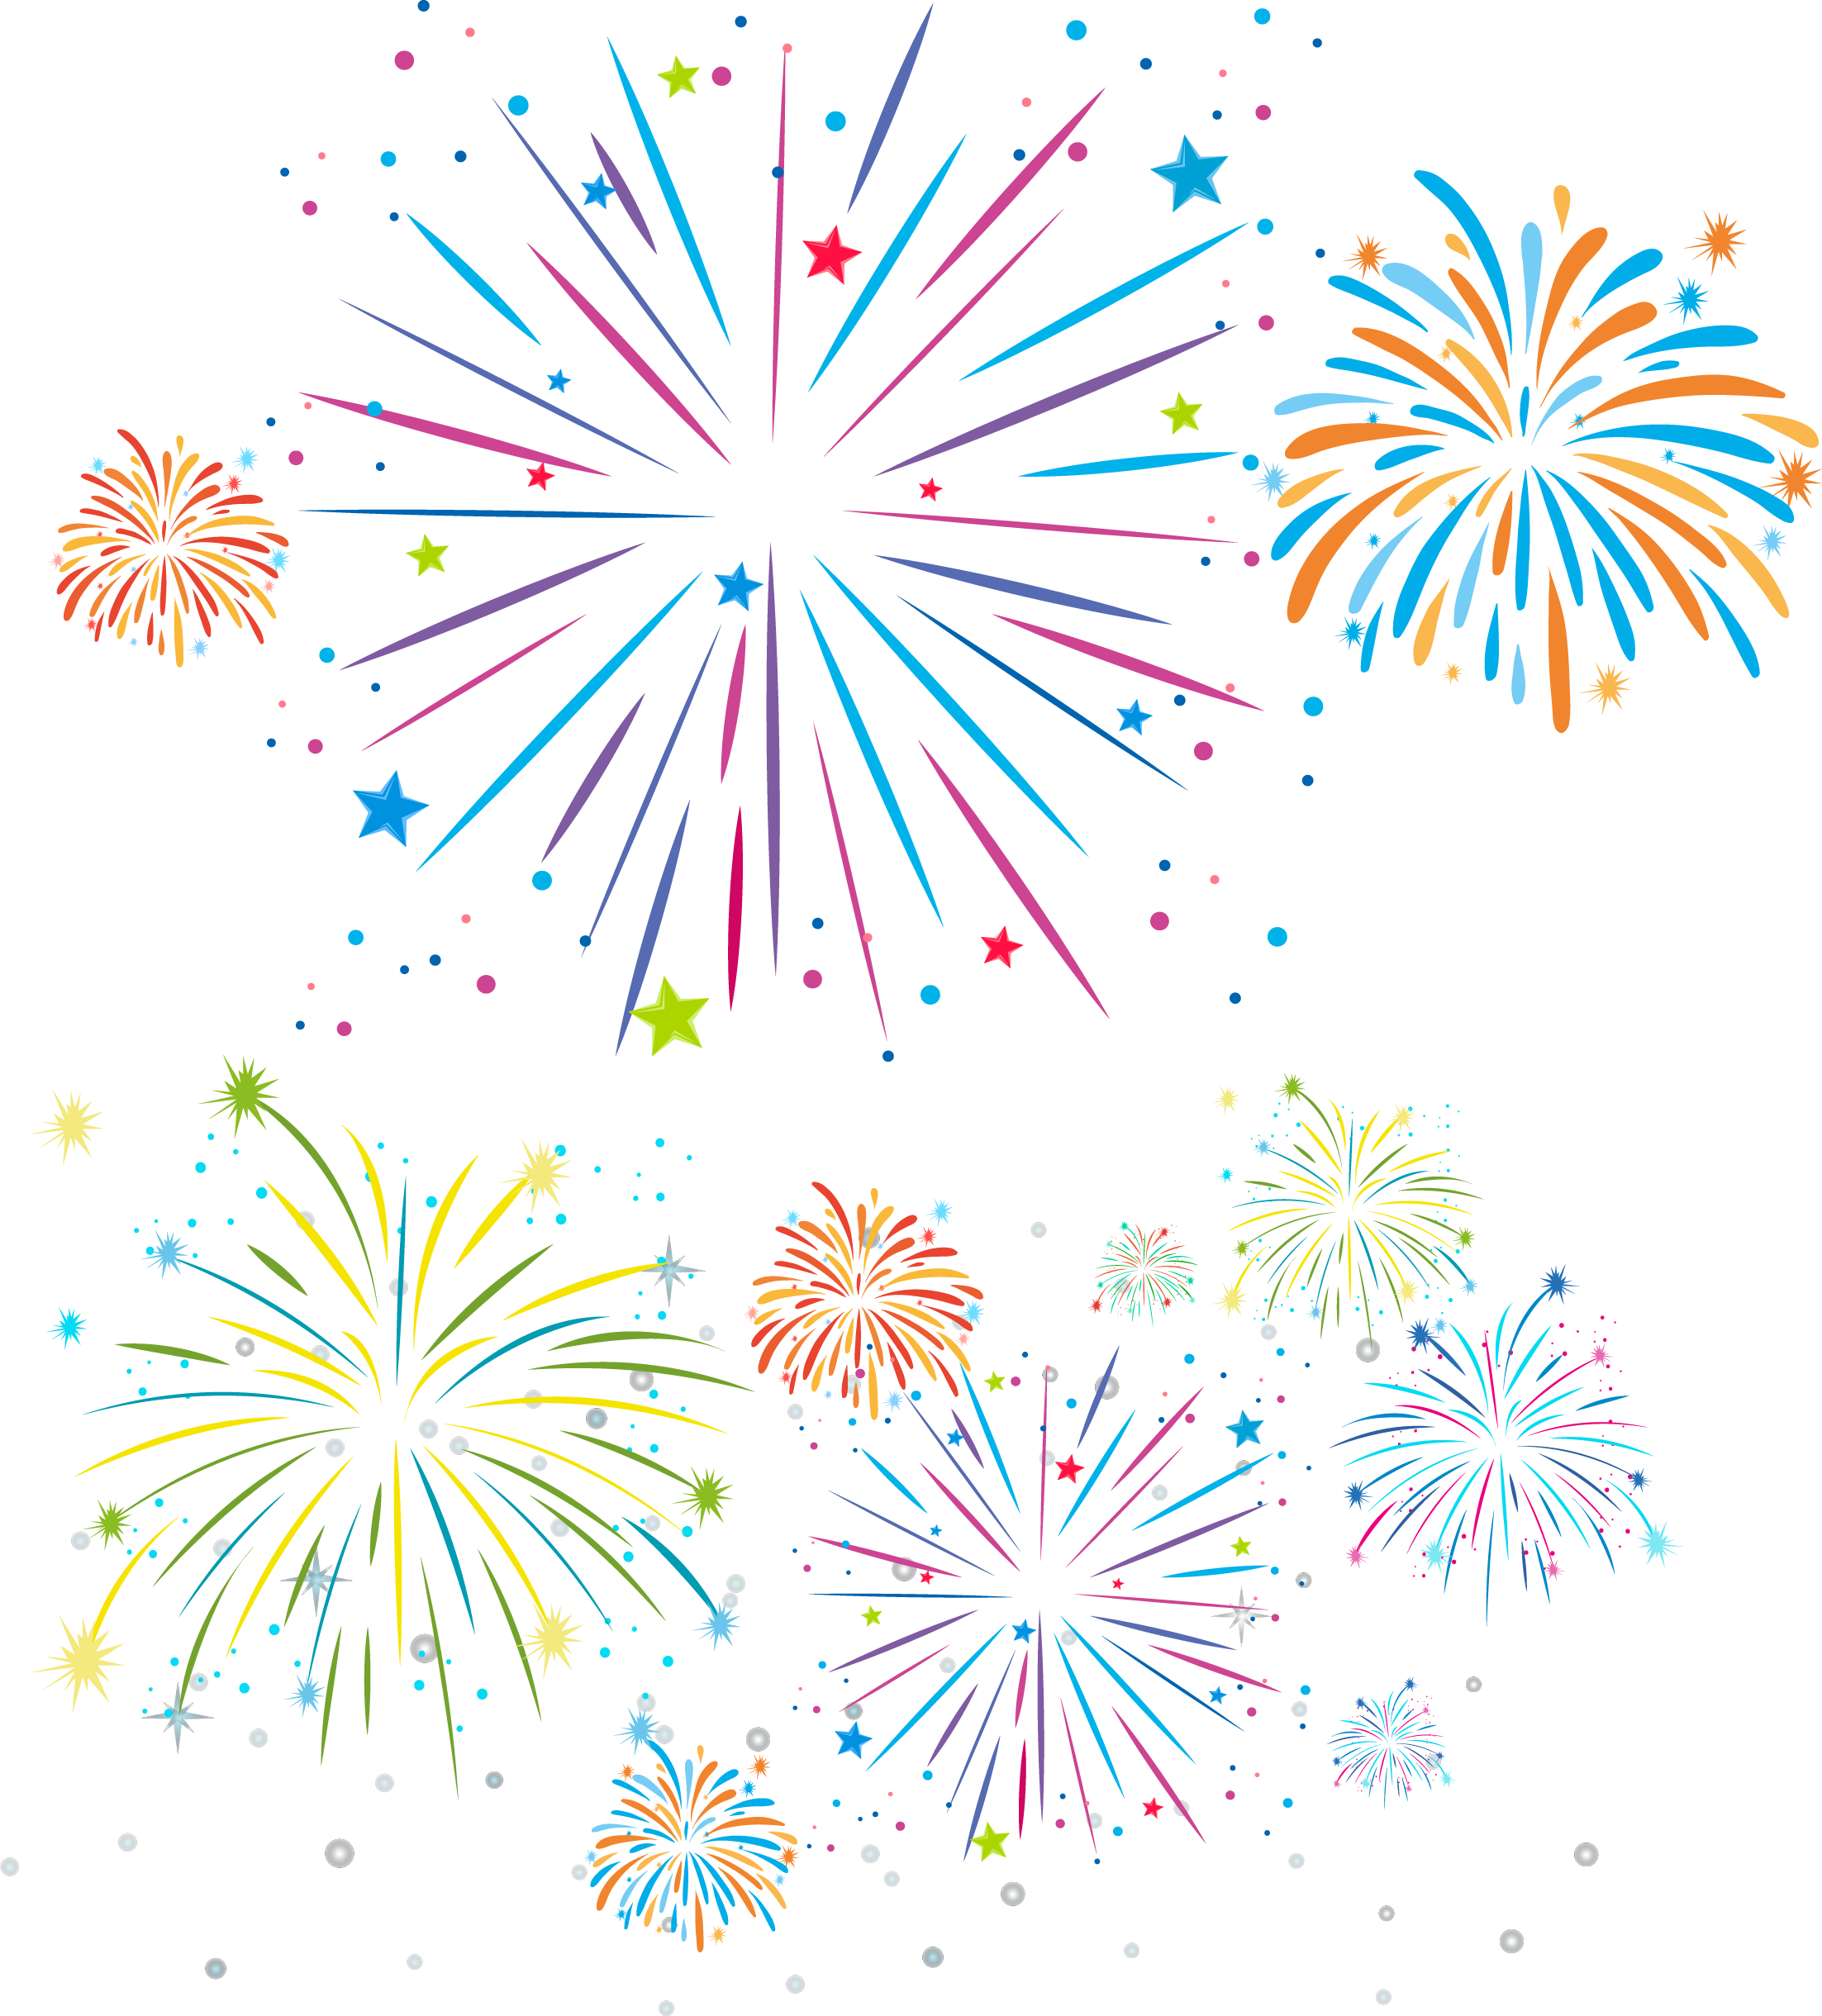 Fireworks drawing royalty free. Firework clipart festivity